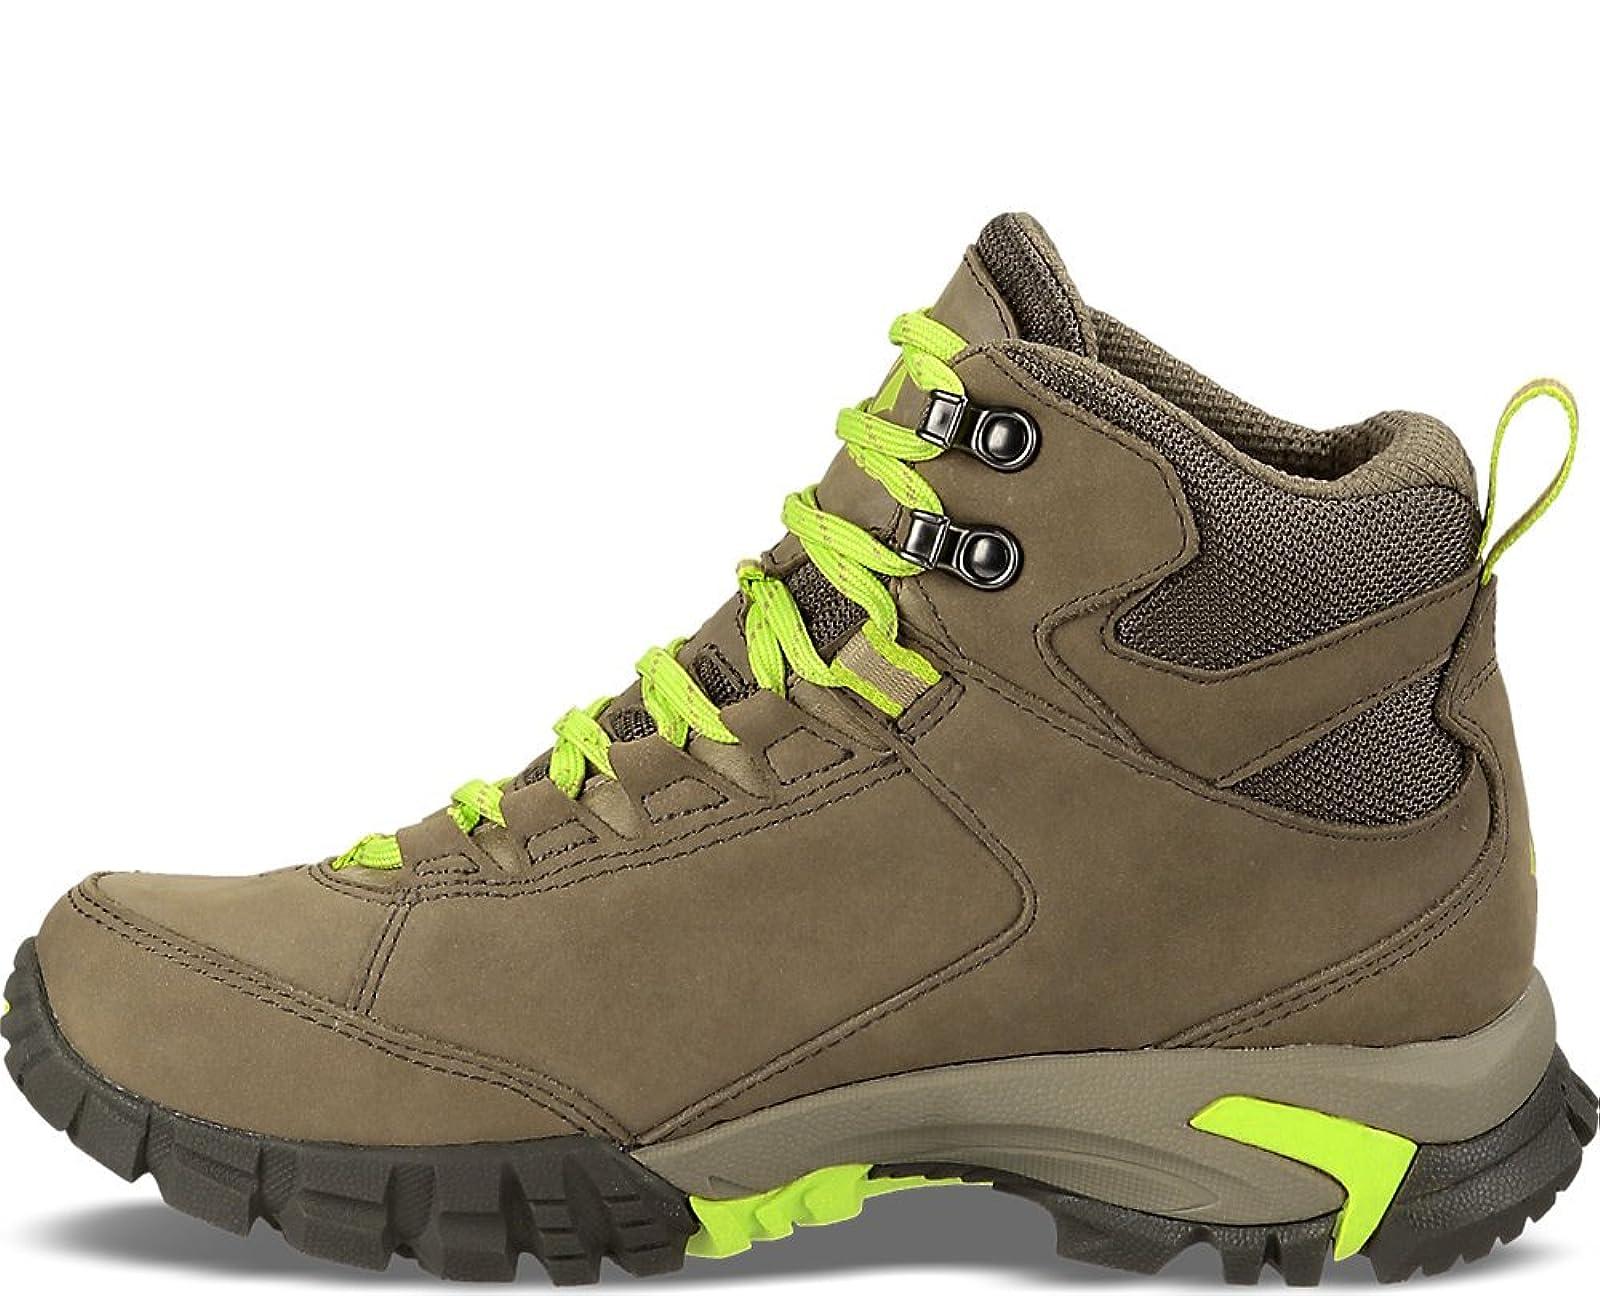 Vasque Women's Talus Trek UltraDry Hiking Boot US - 2